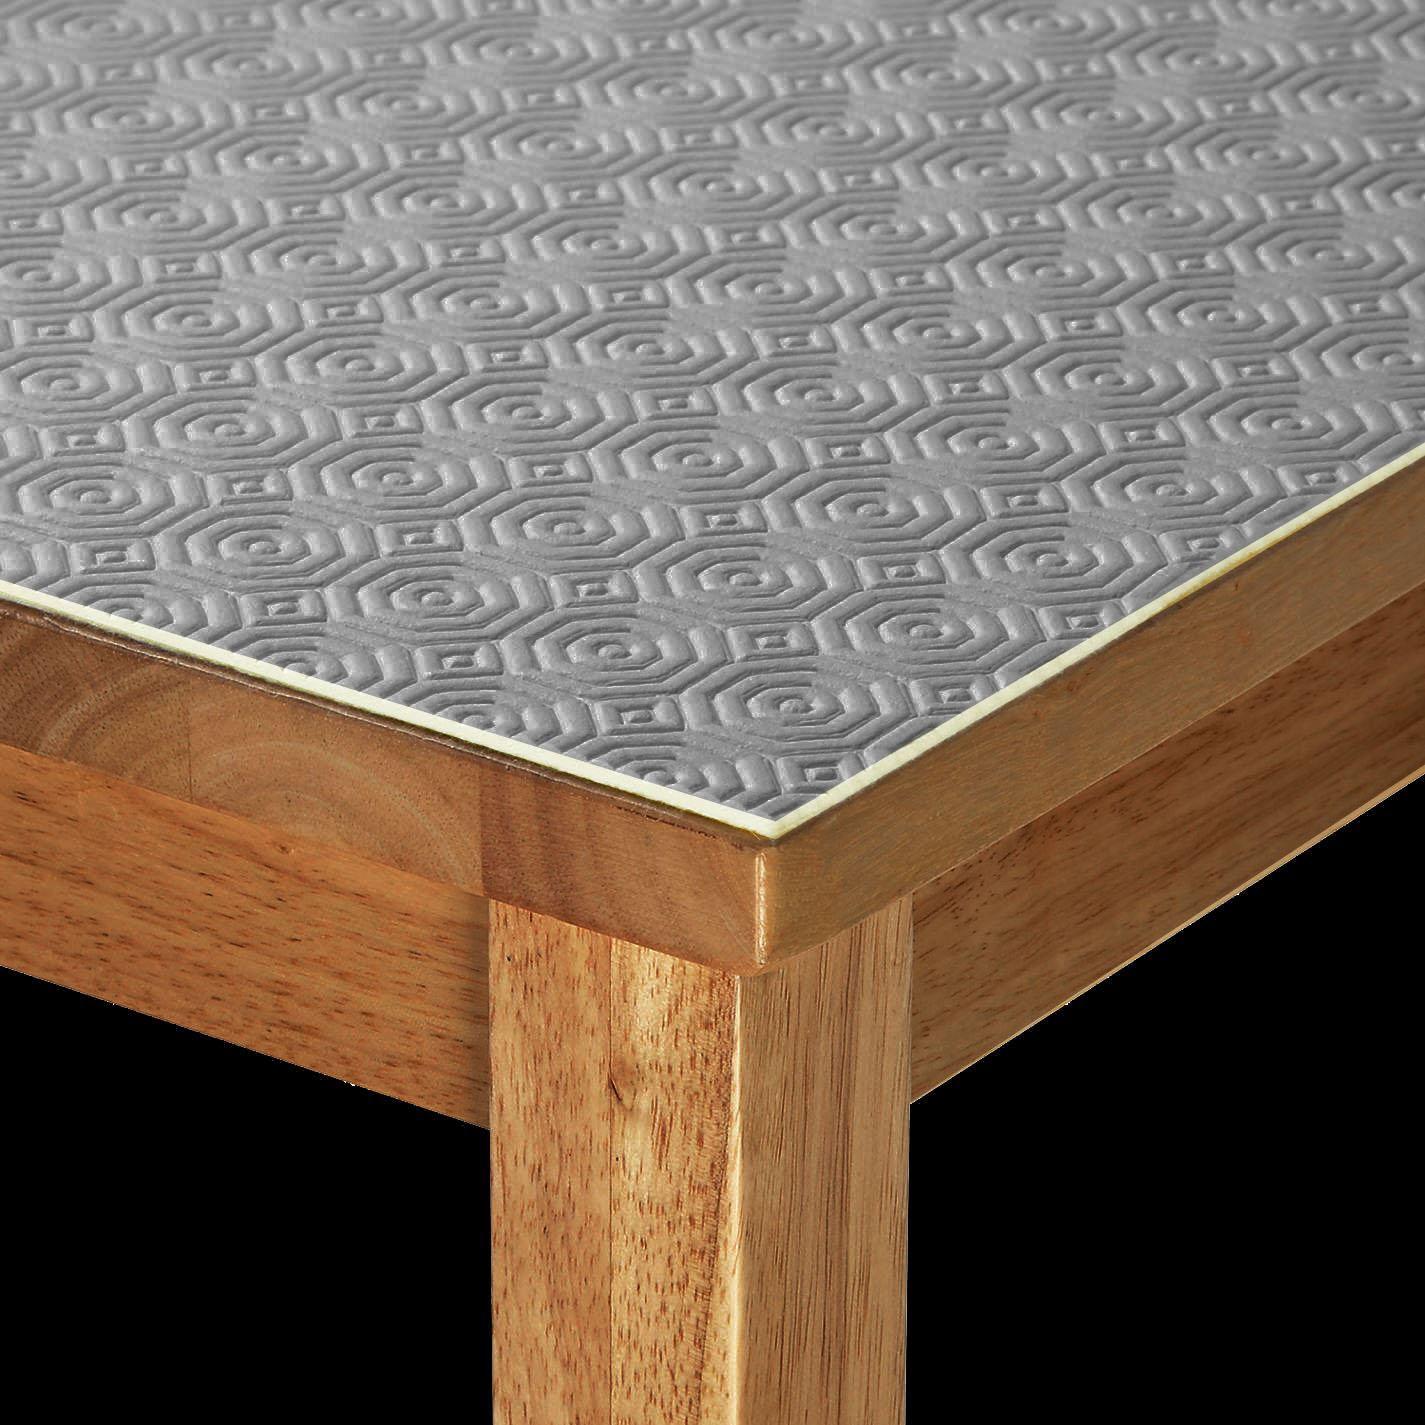 Luxury Heat Resistant Table Protector